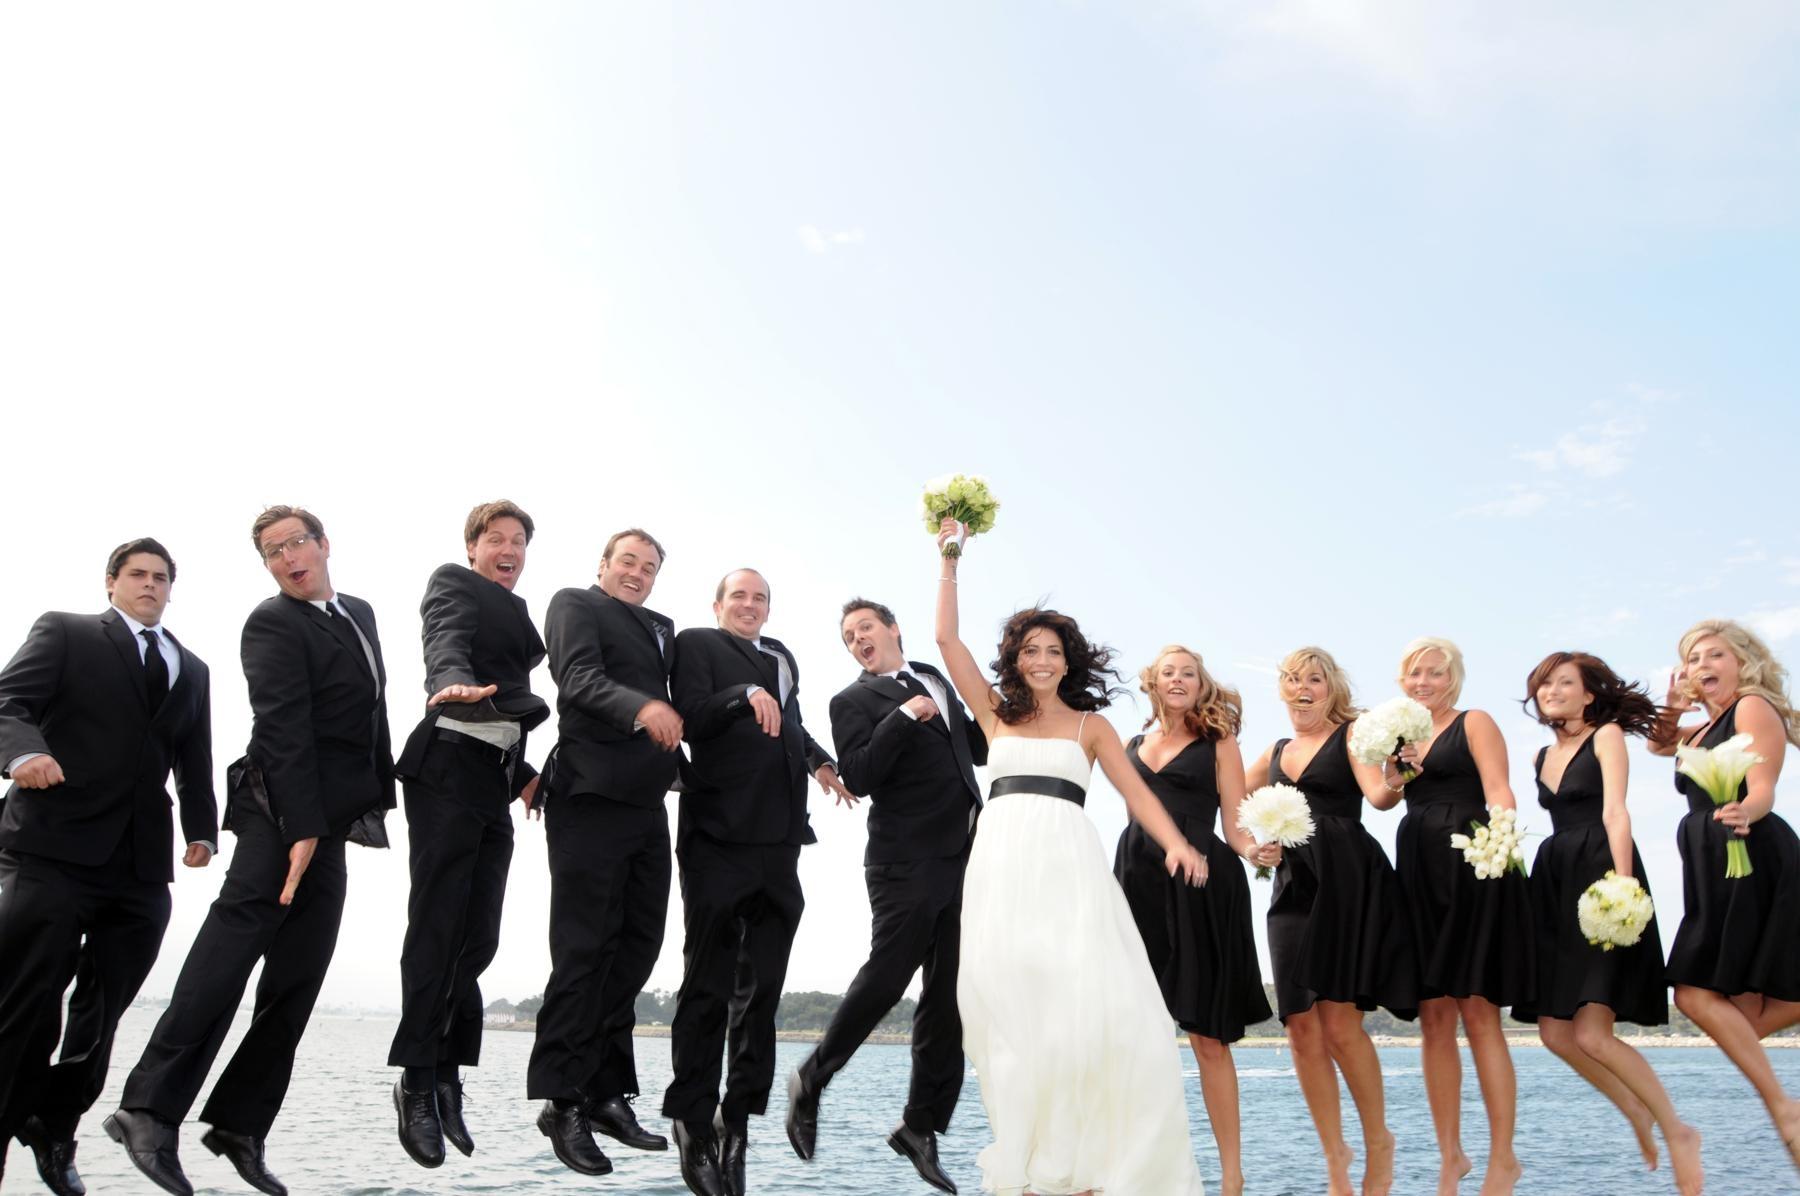 San Francisco Bay Area Destination Wedding Photographer & Bay Area Corporate Event Photographer